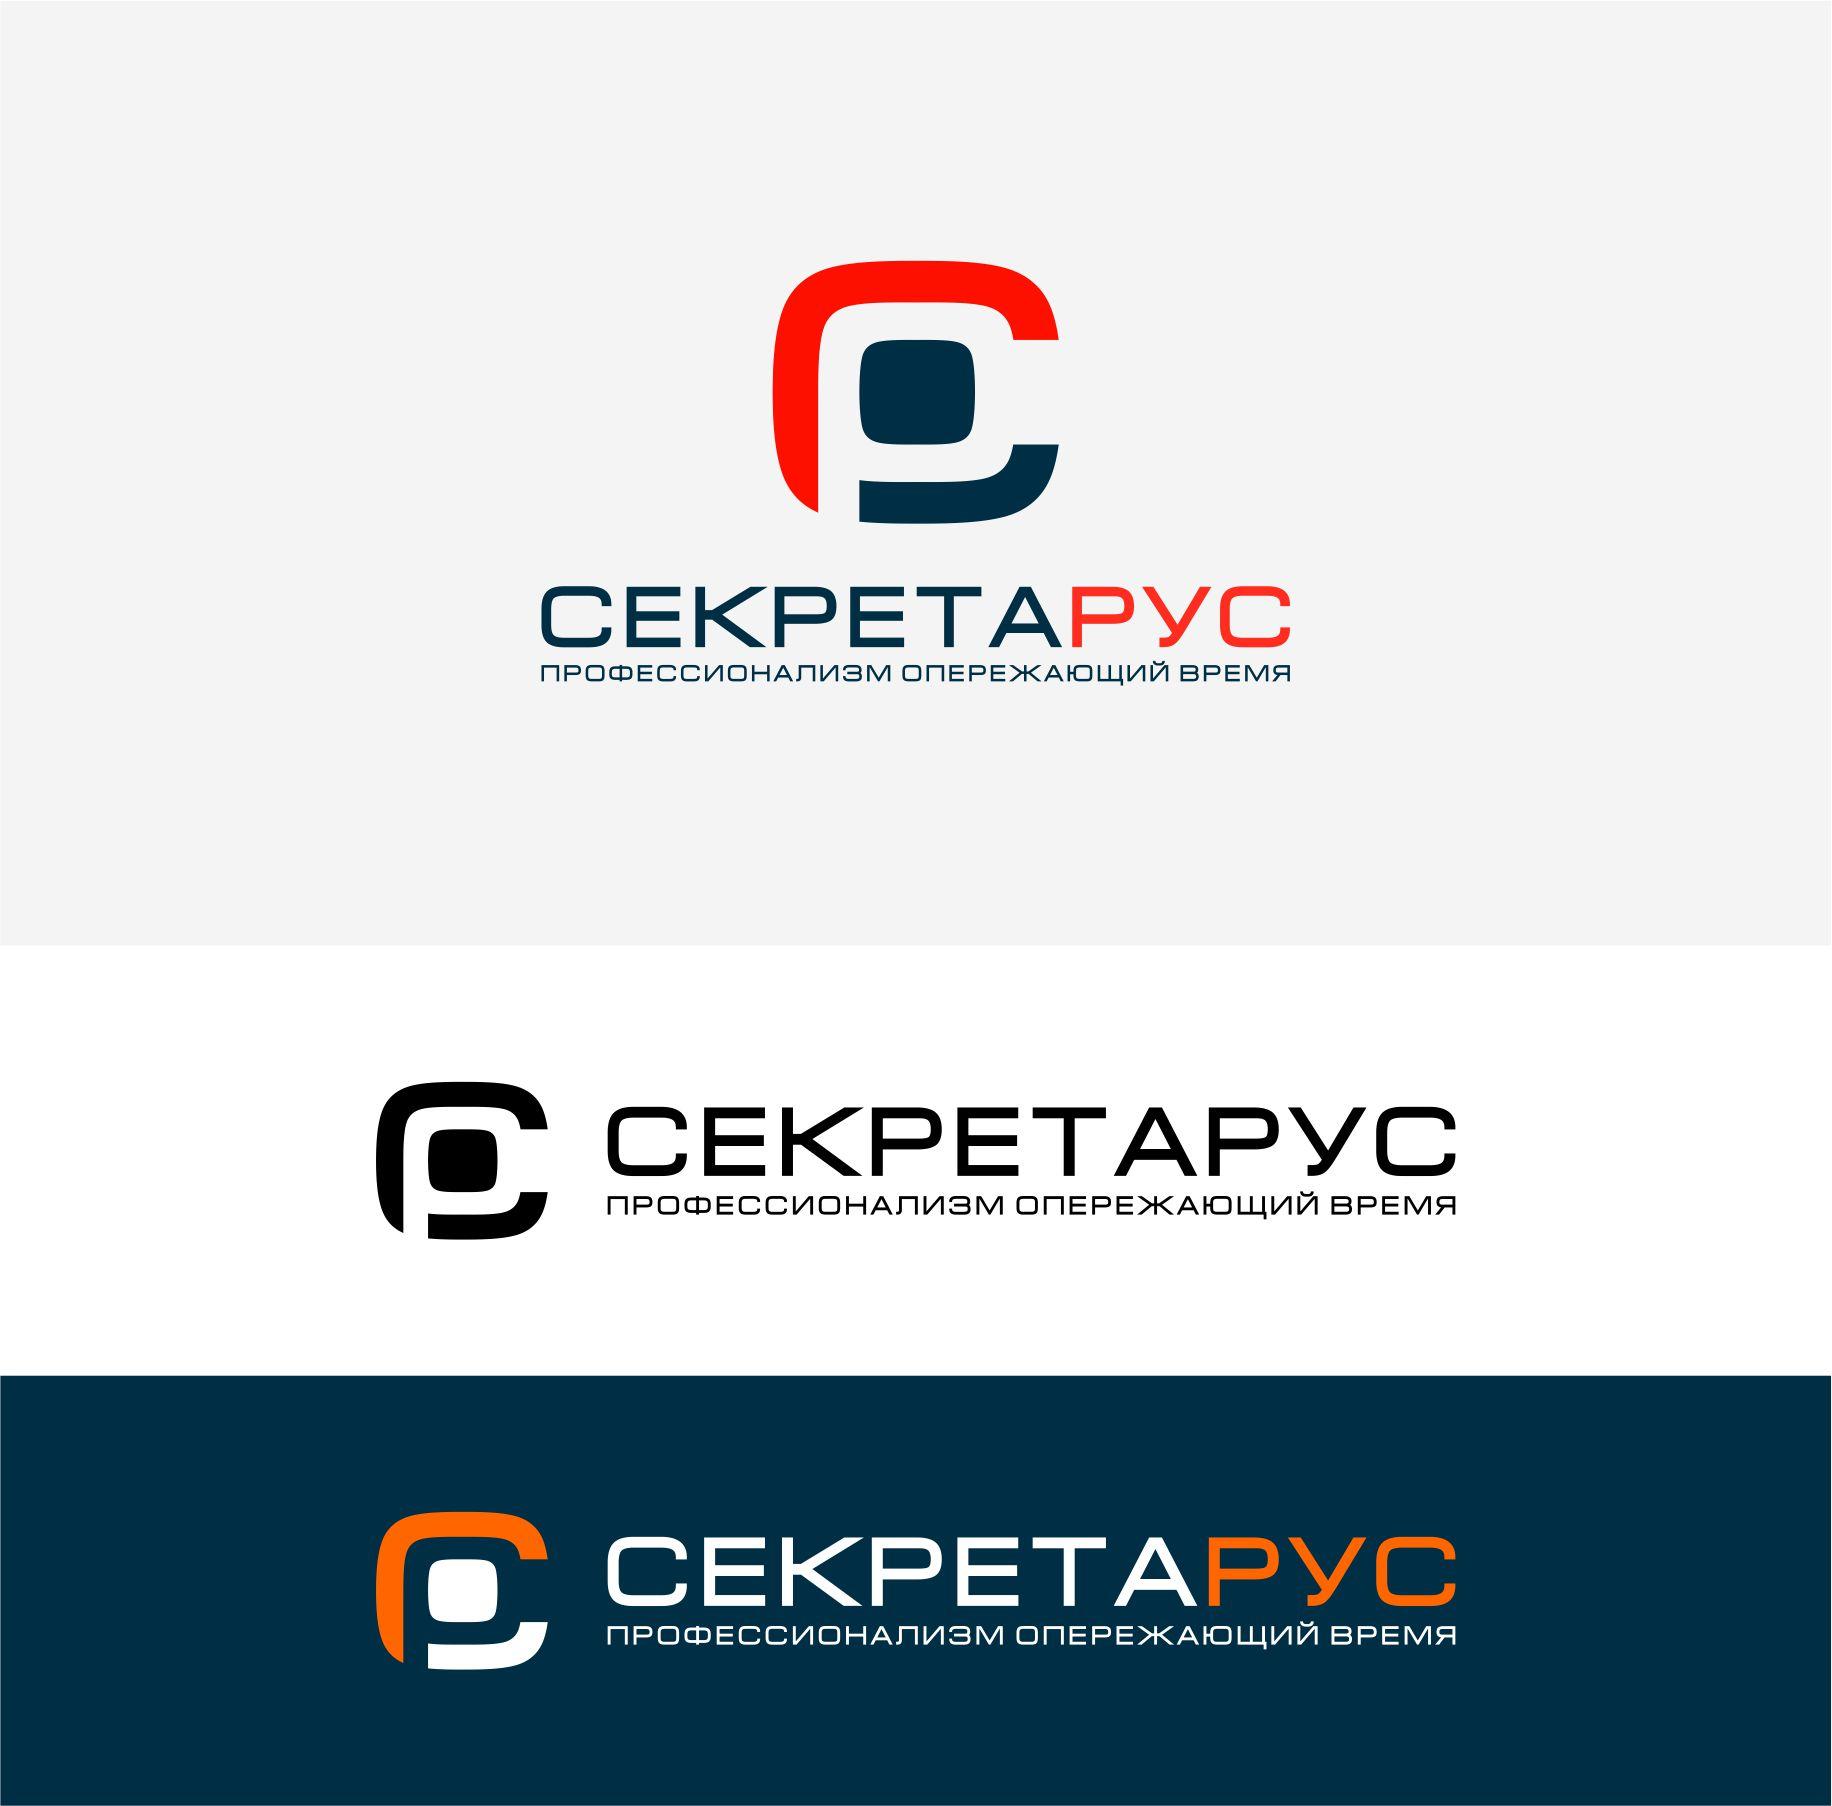 Разработка логотипа и фирменного стиля для сайта фото f_0365a463c3bce559.jpg